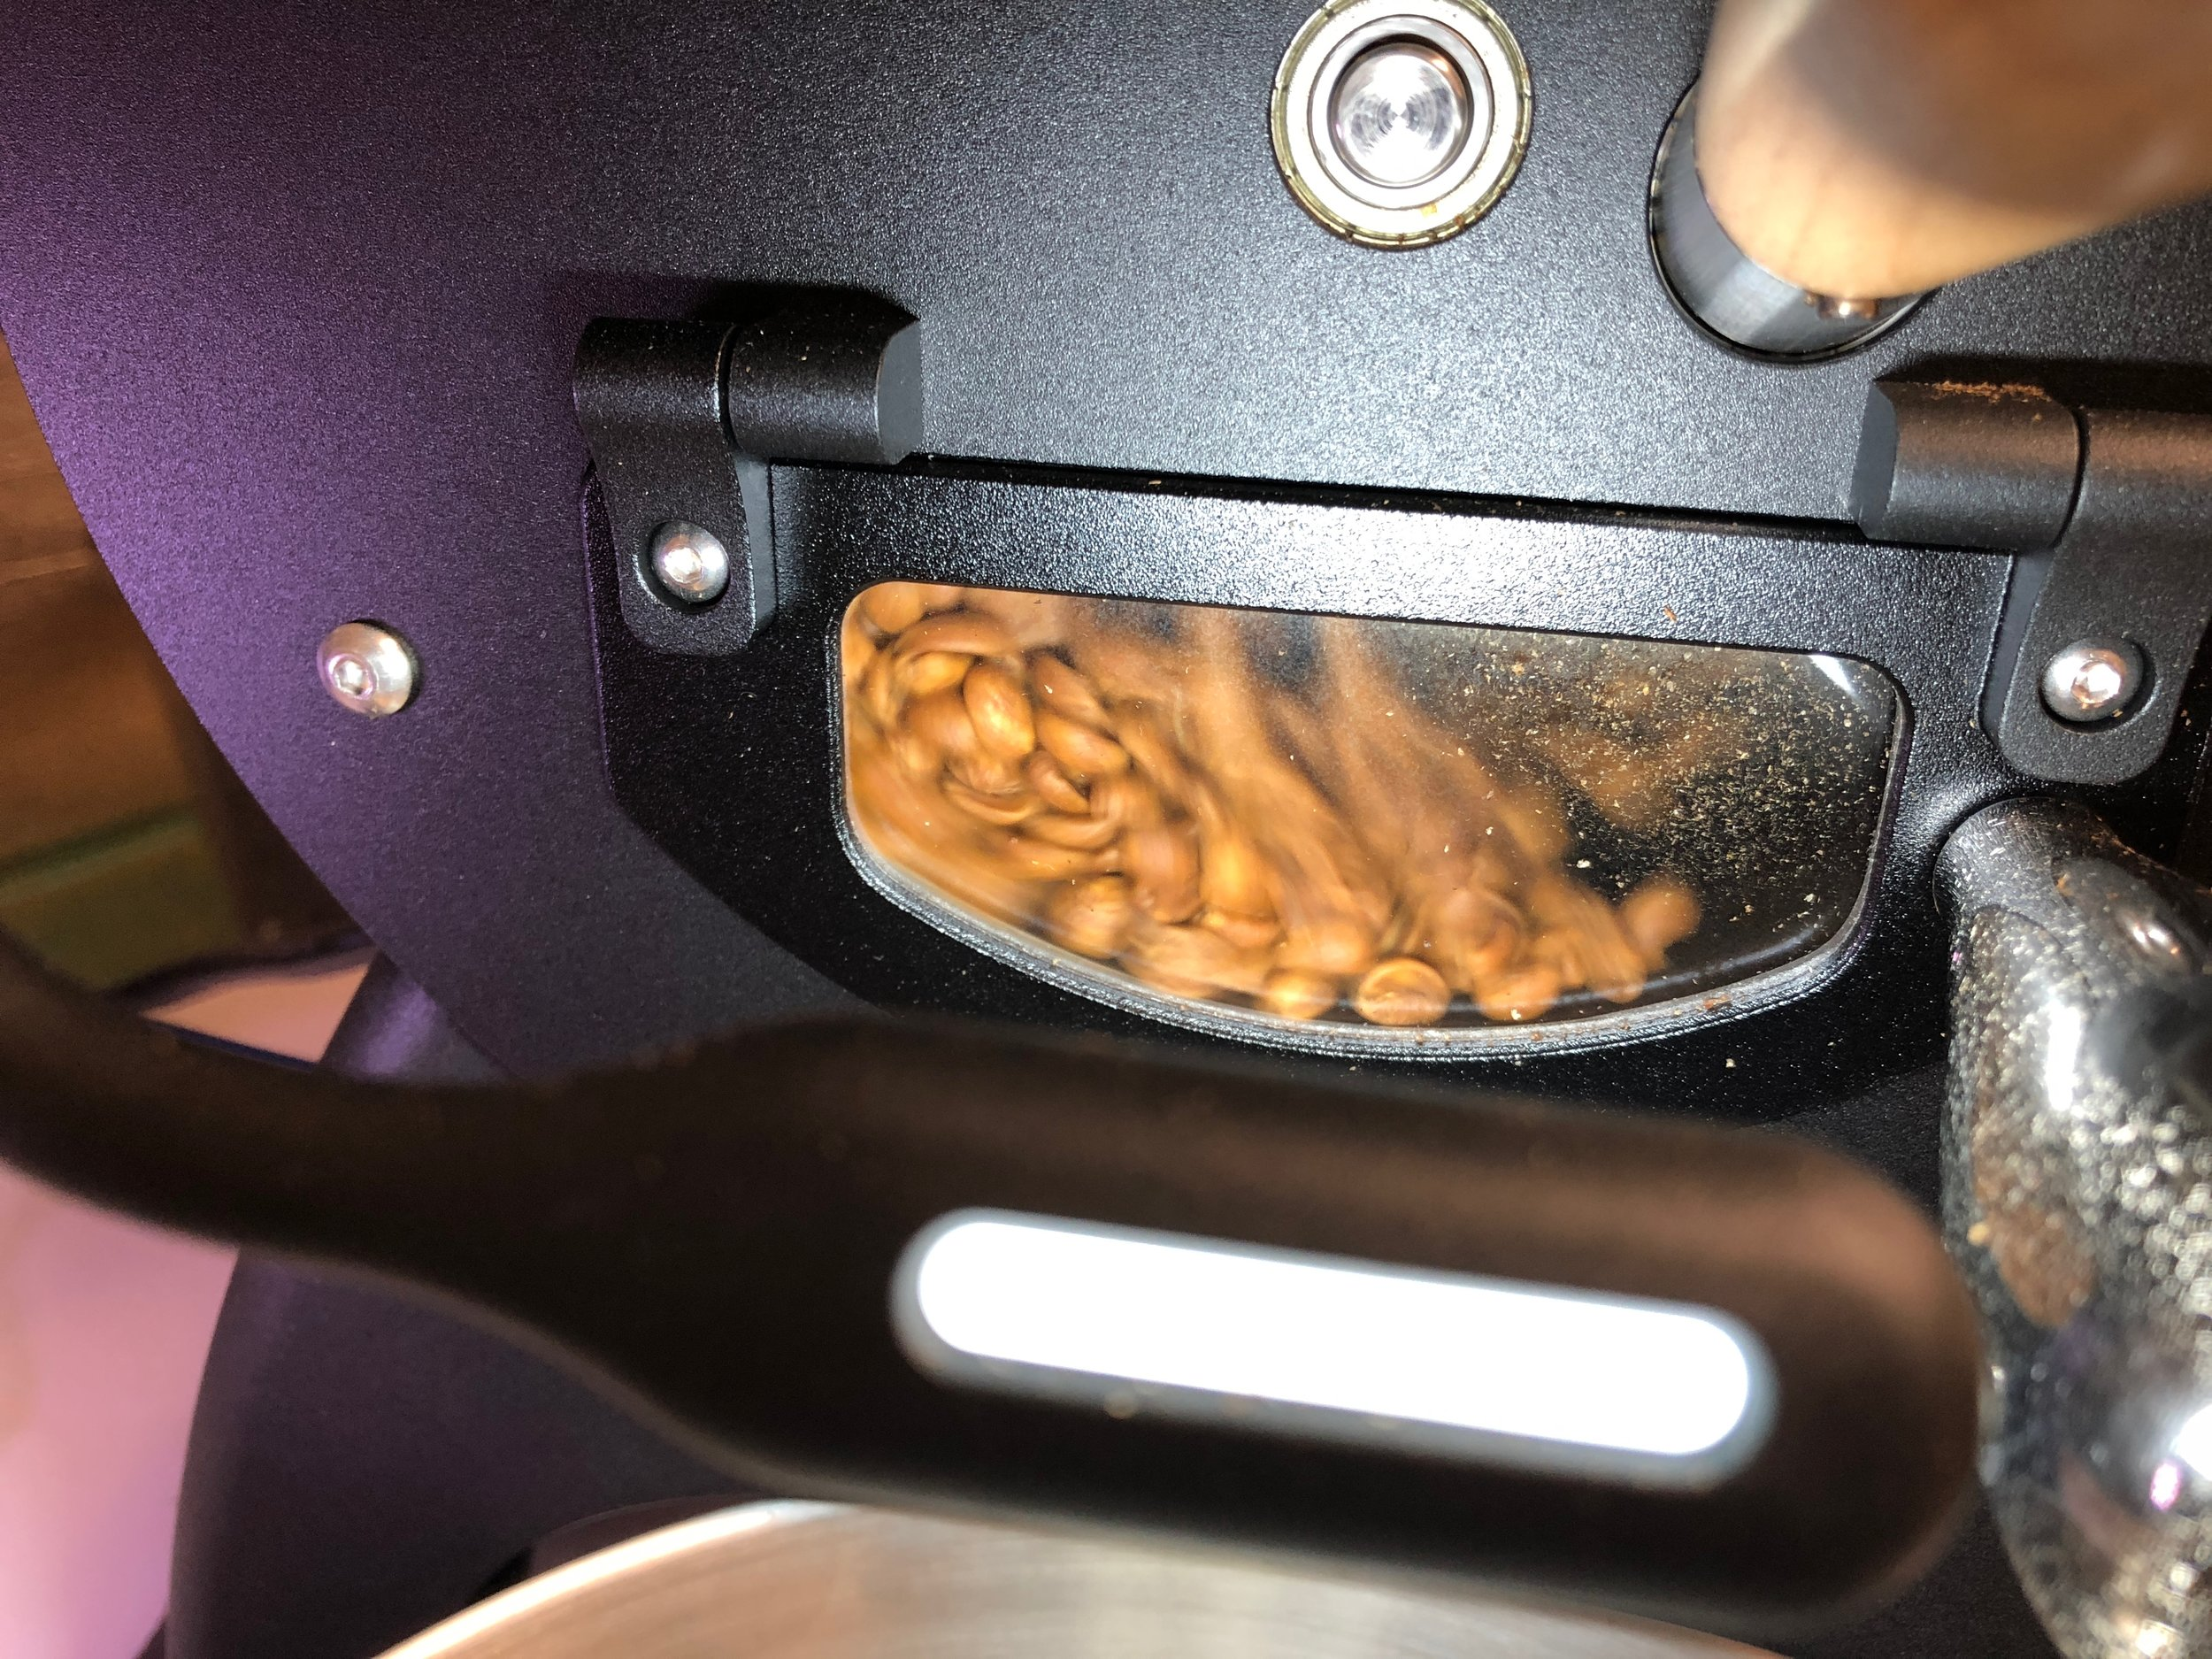 Beans roasting in my Aillio Bullet roaster